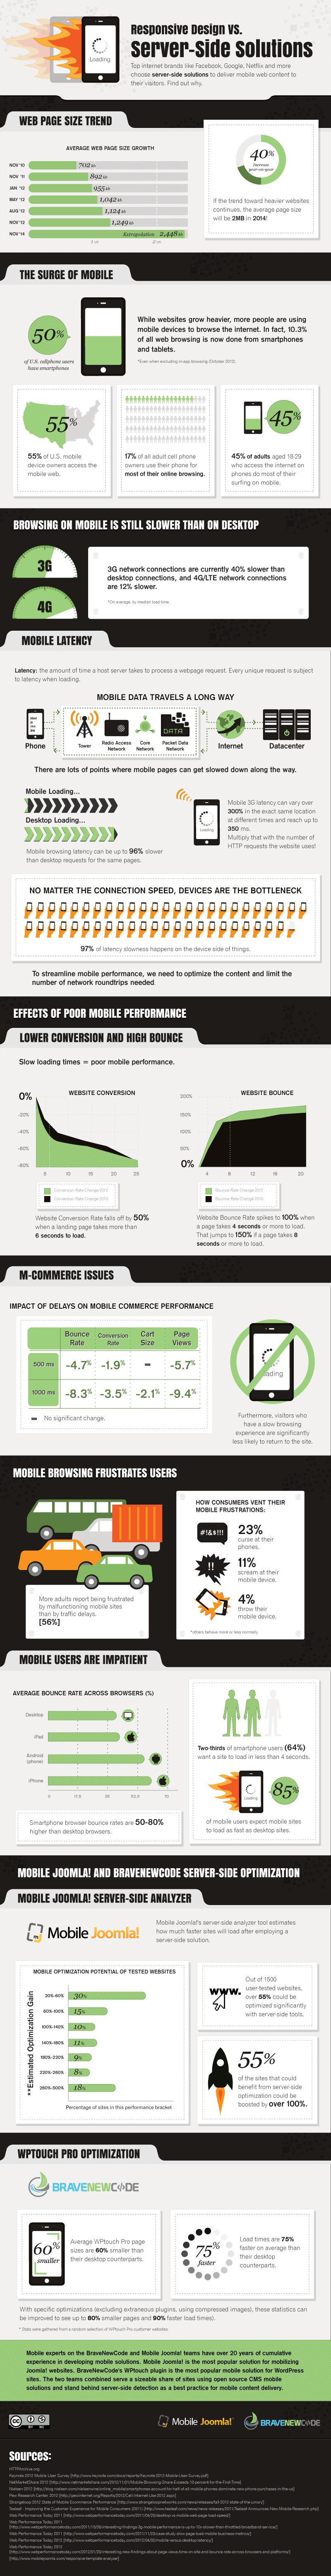 Responsive-Design-vs-Server-Side-Solutions-Infographic